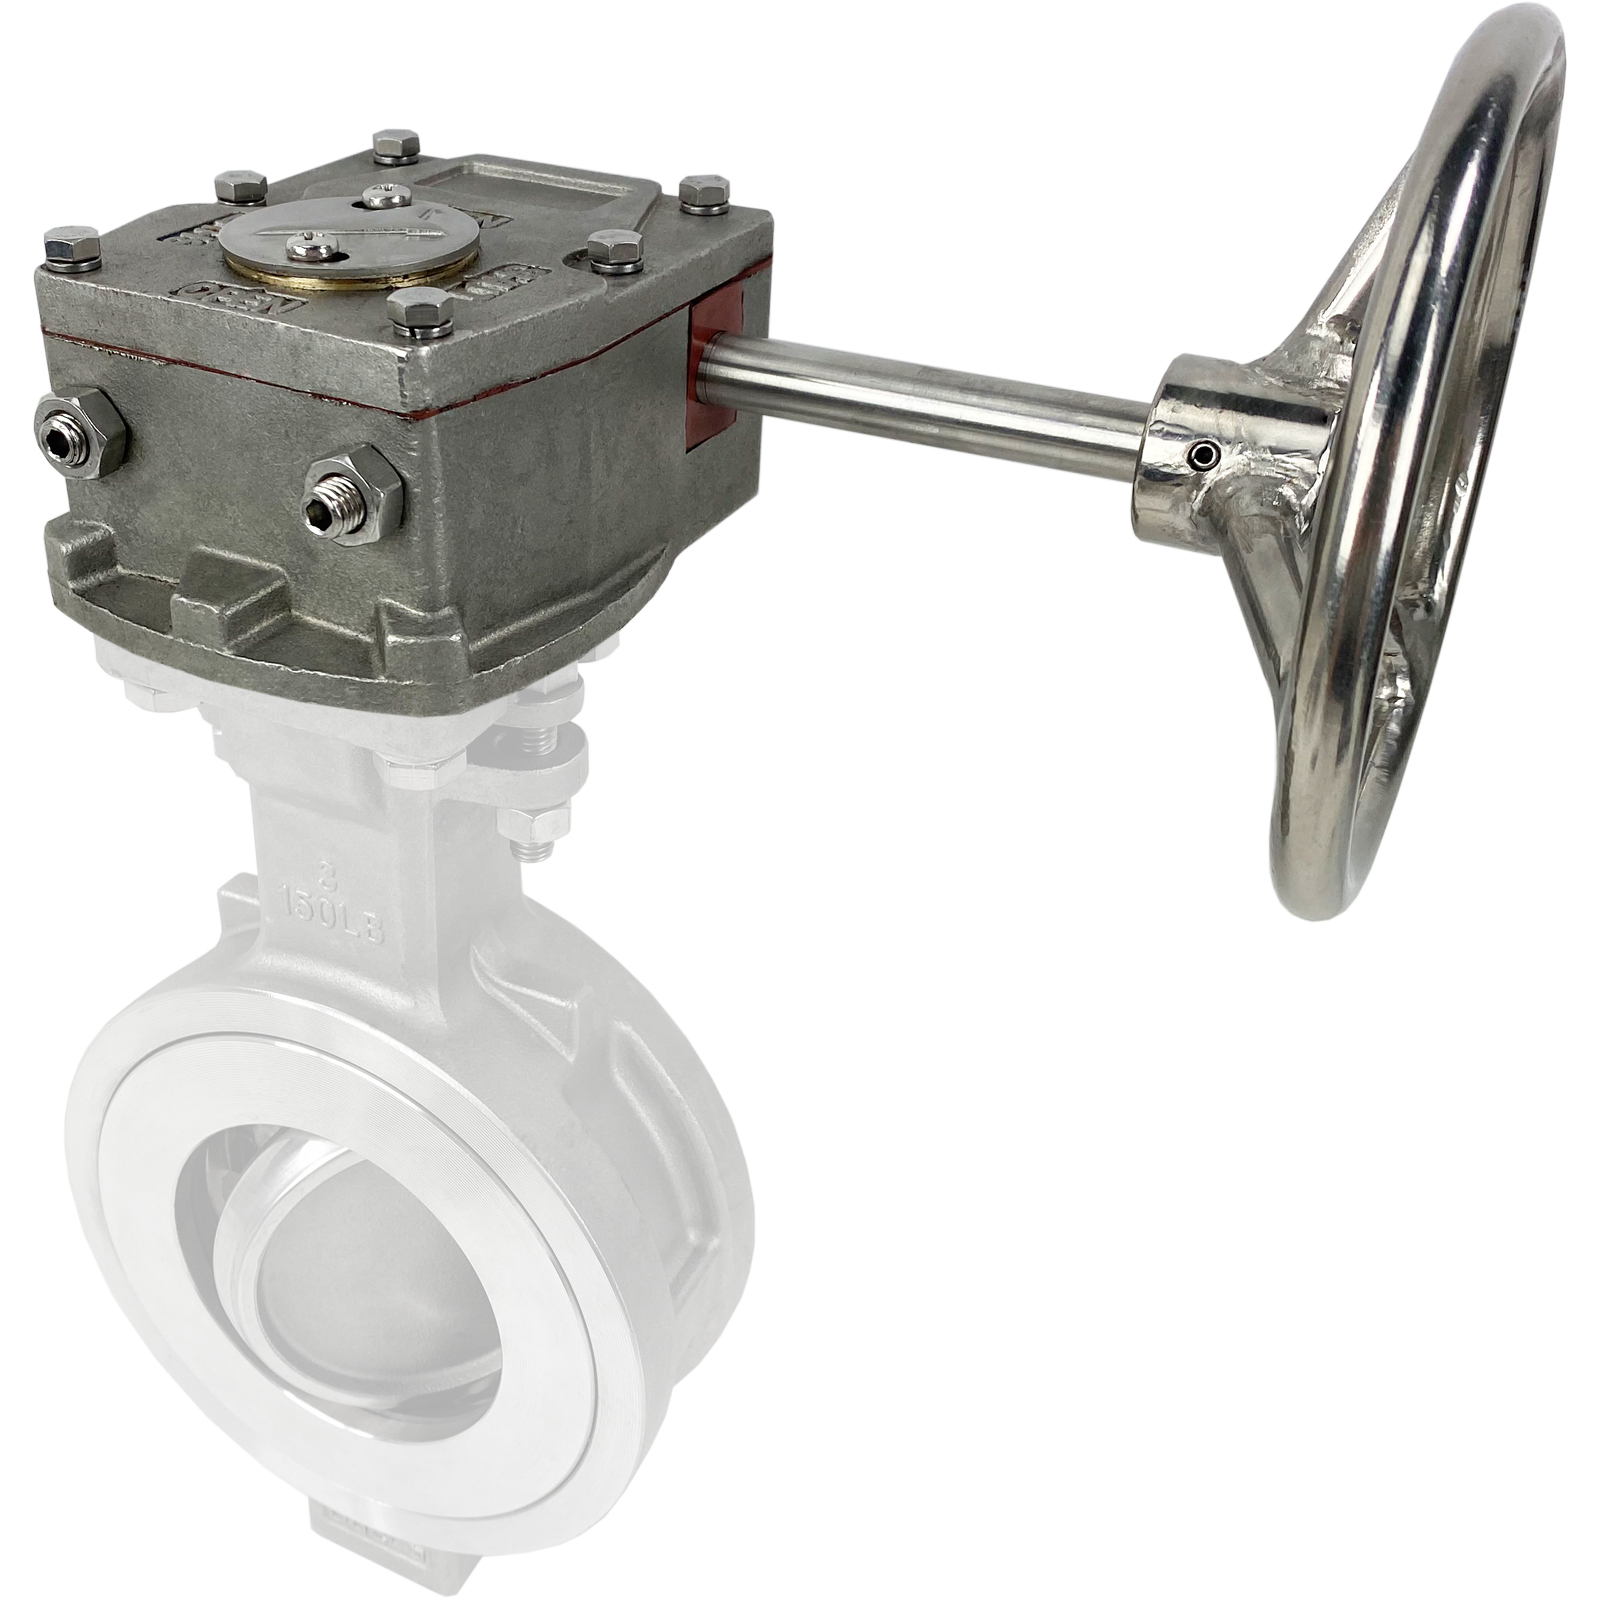 High Performance Gear Operator Handwheel, 11mm Drive